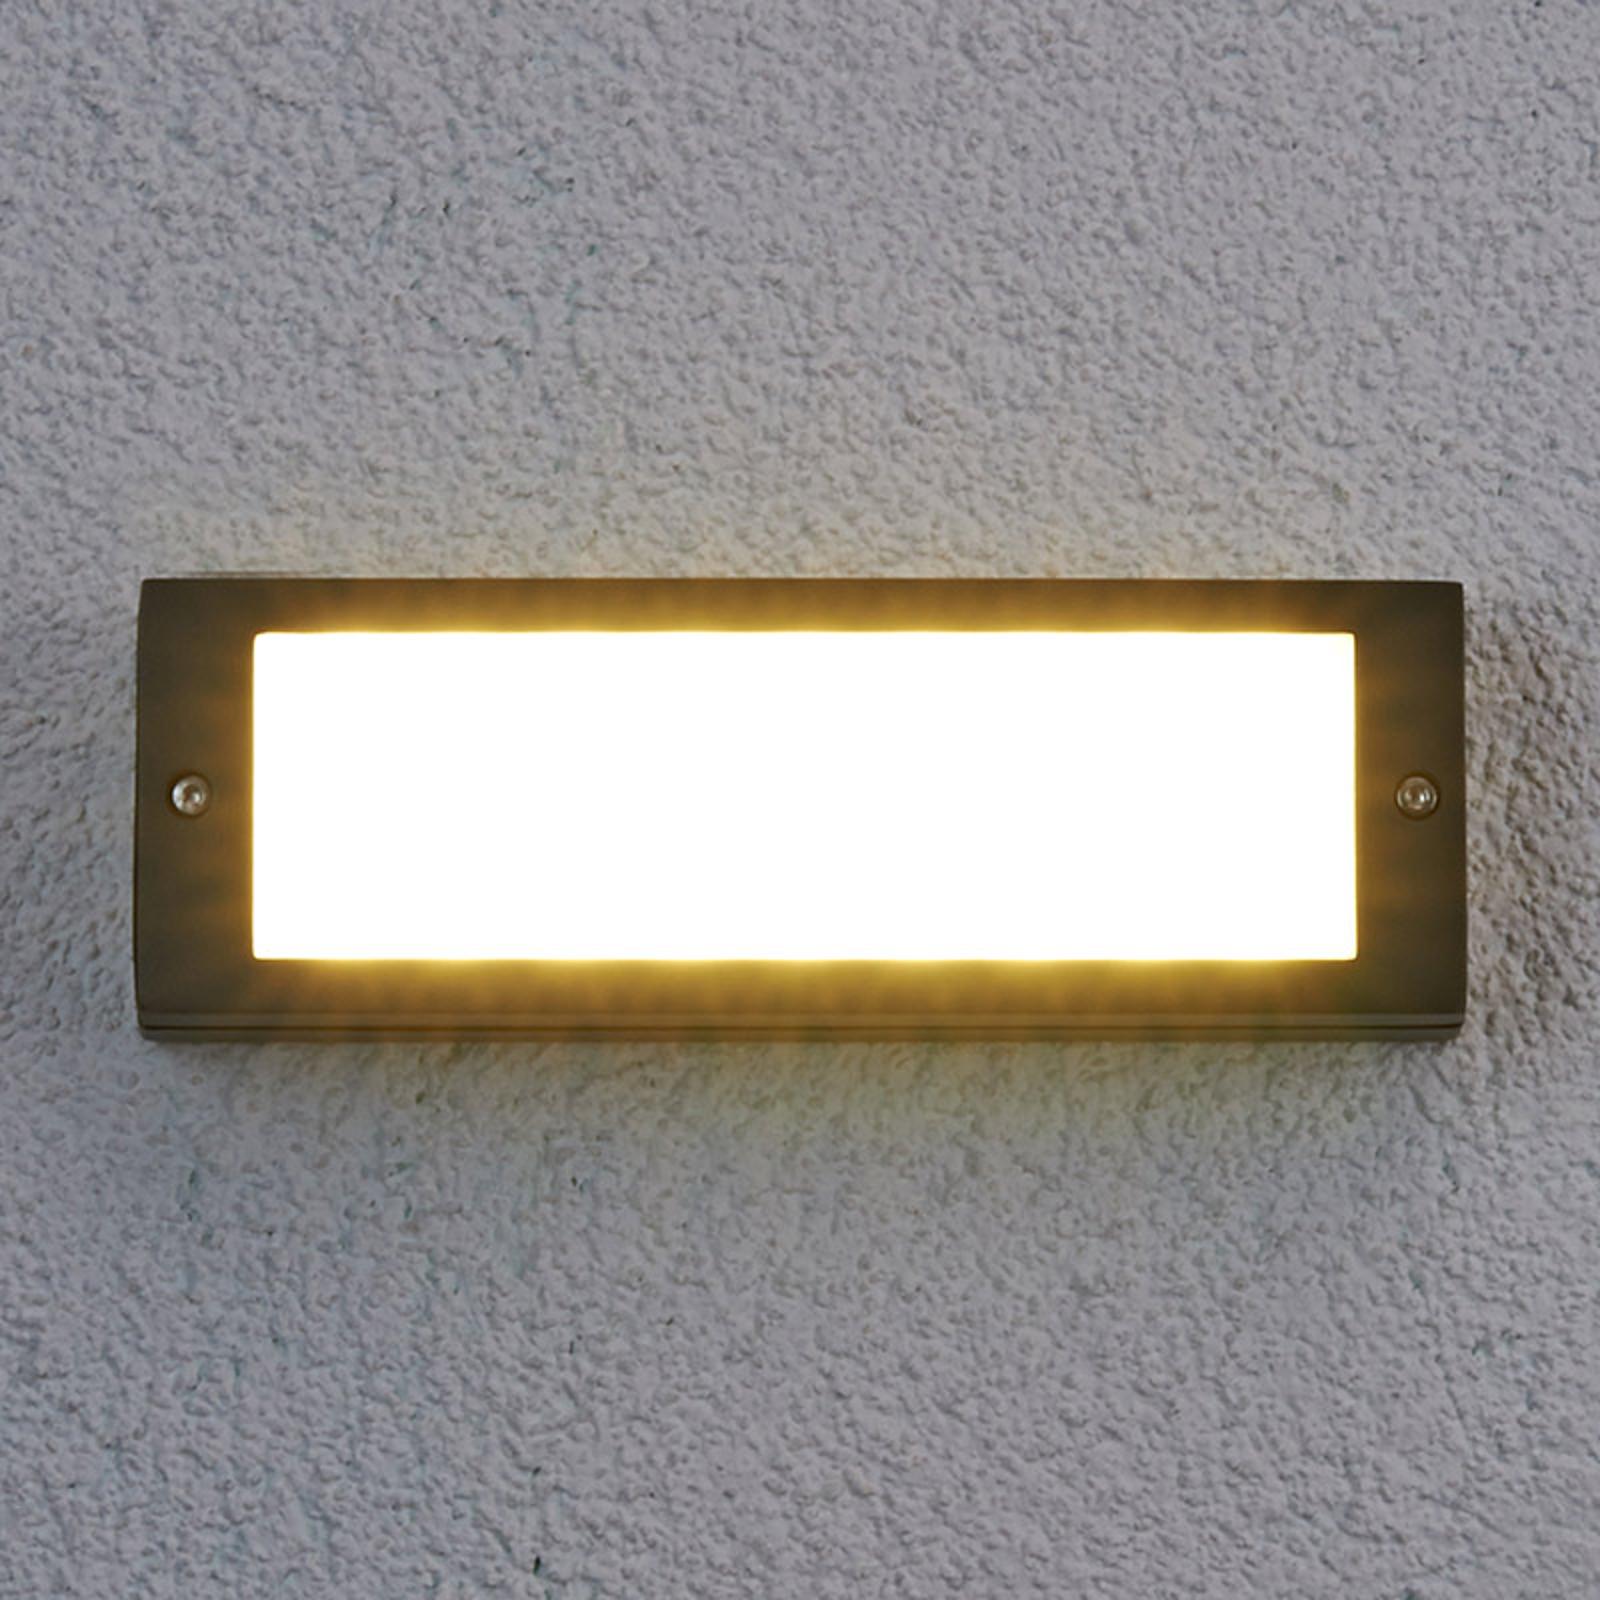 Energooszczędna zewn. lampa ścienna LED Rachel